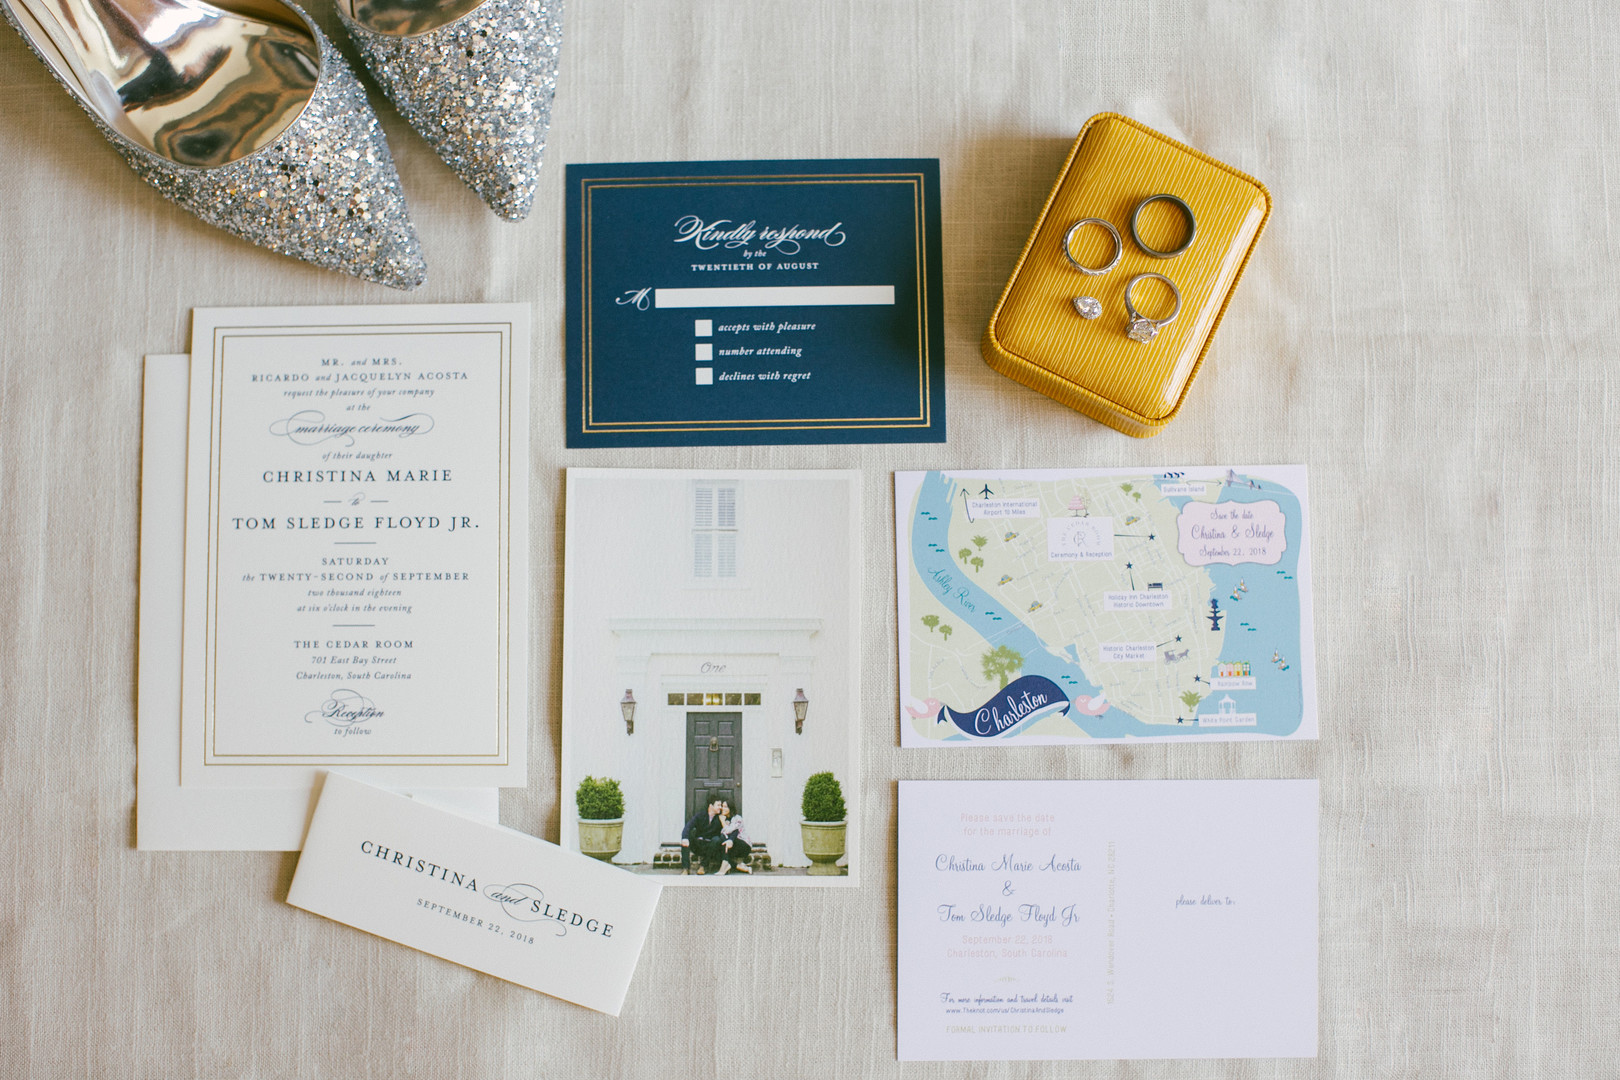 cedar-room-wedding-4.jpg